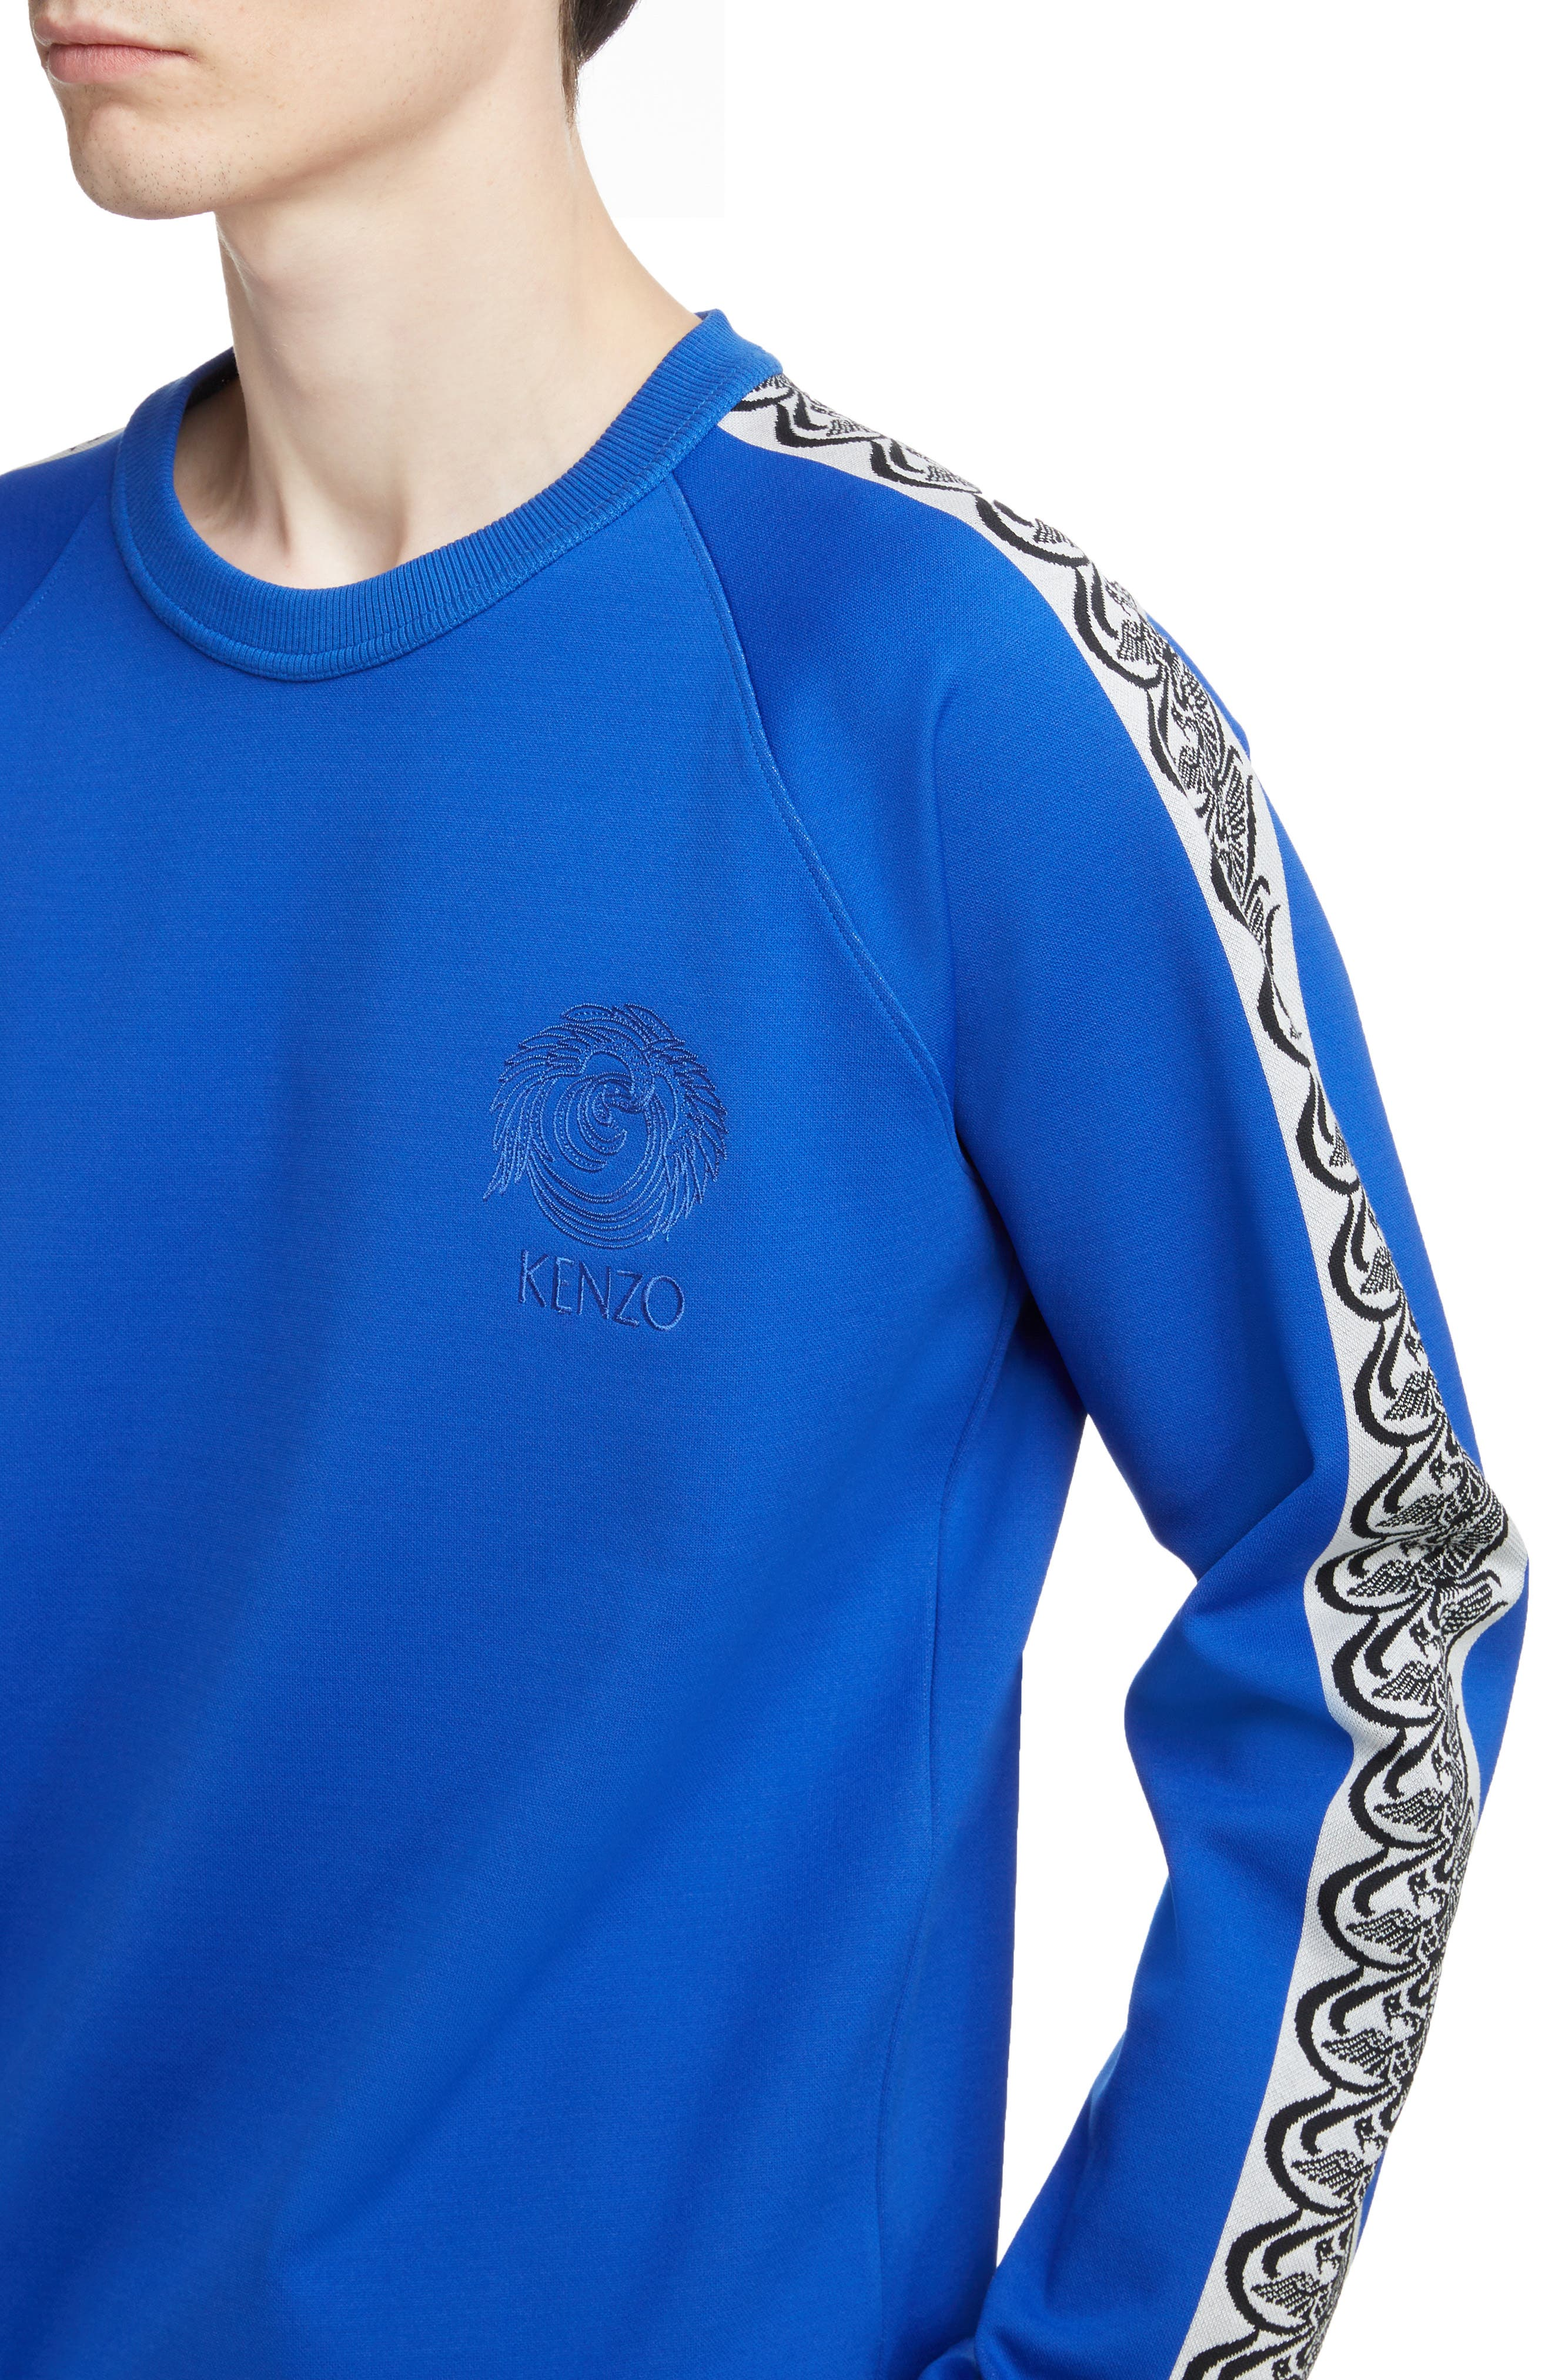 KENZO, Jacquard Raglan Sweatshirt, Alternate thumbnail 4, color, FRENCH BLUE